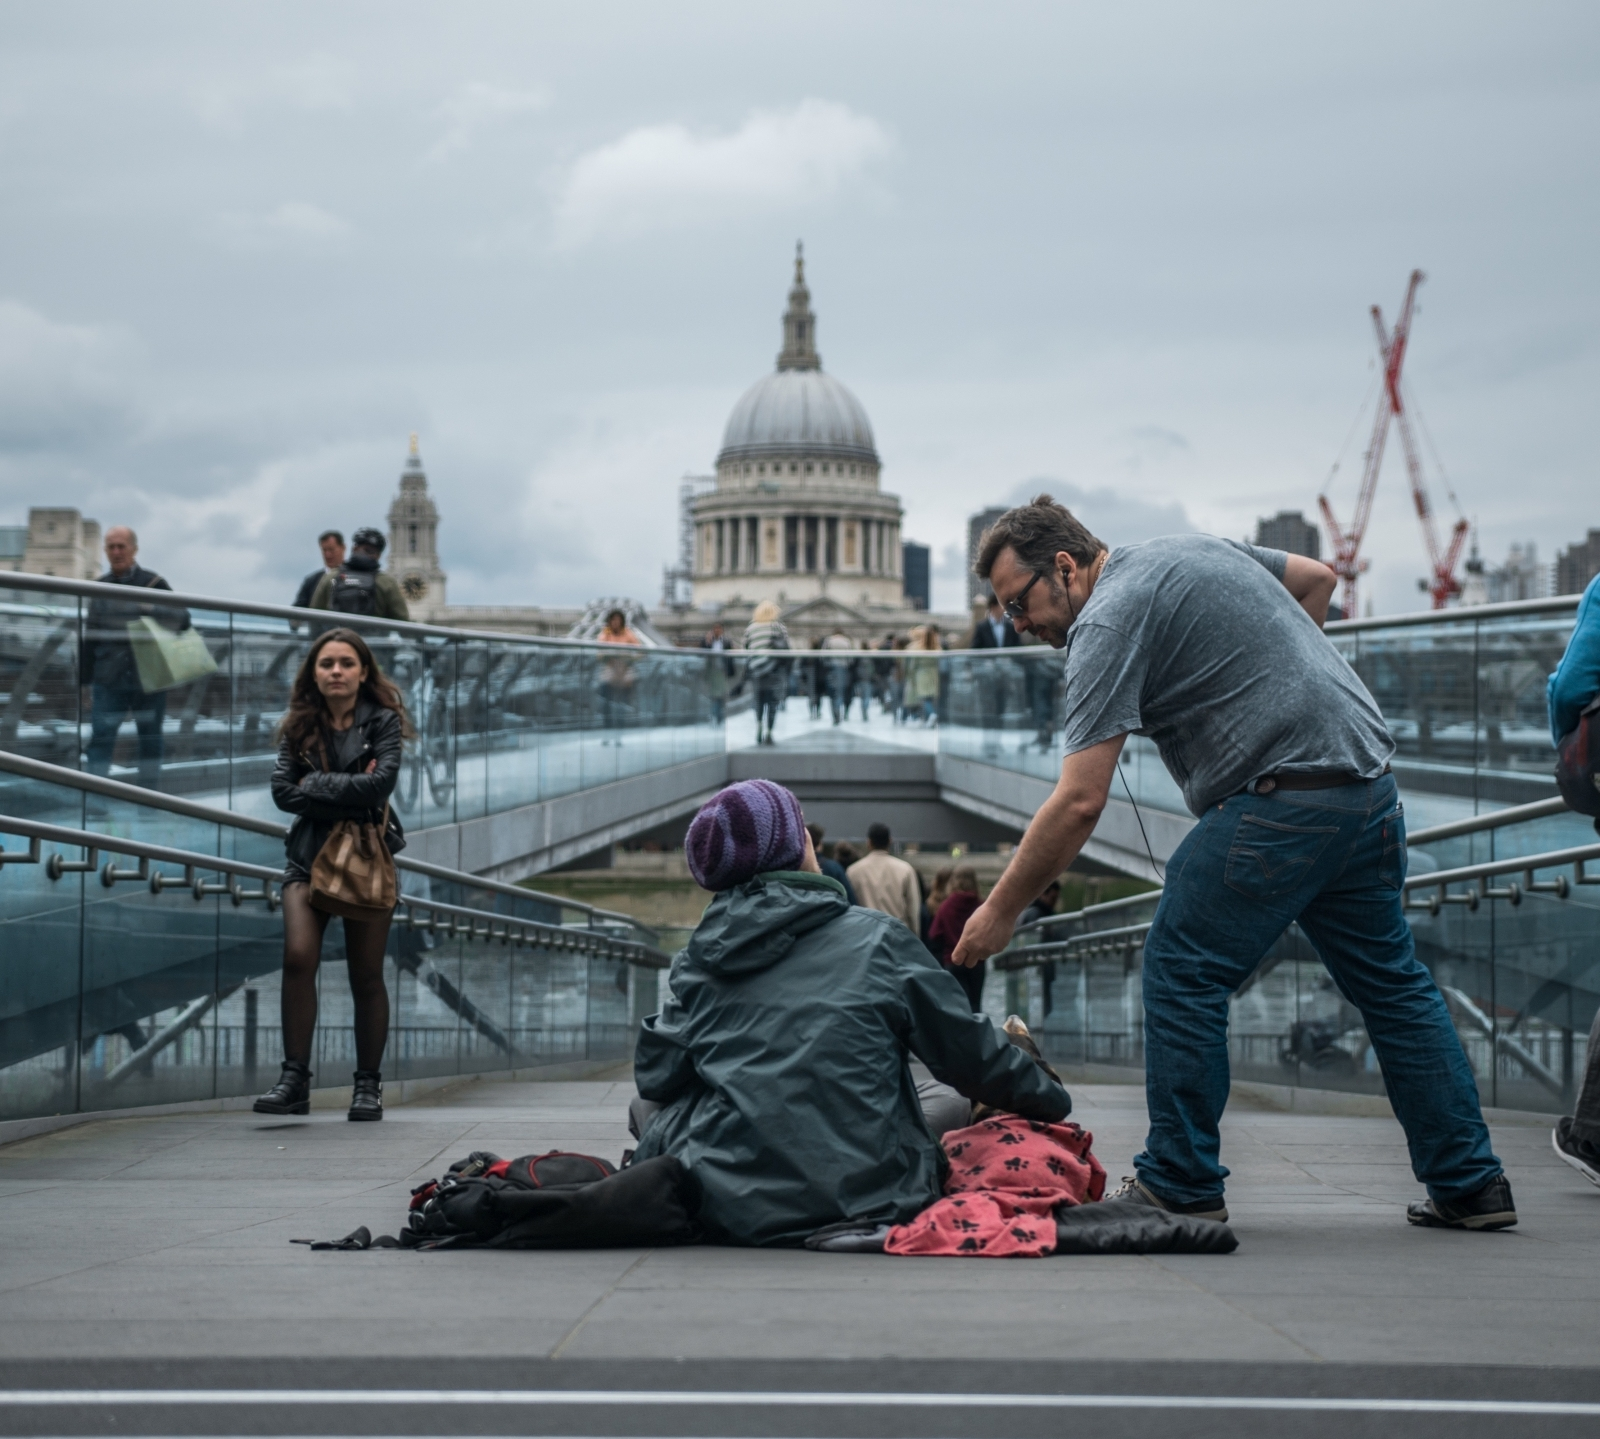 Homeless man on Millennium Bridge